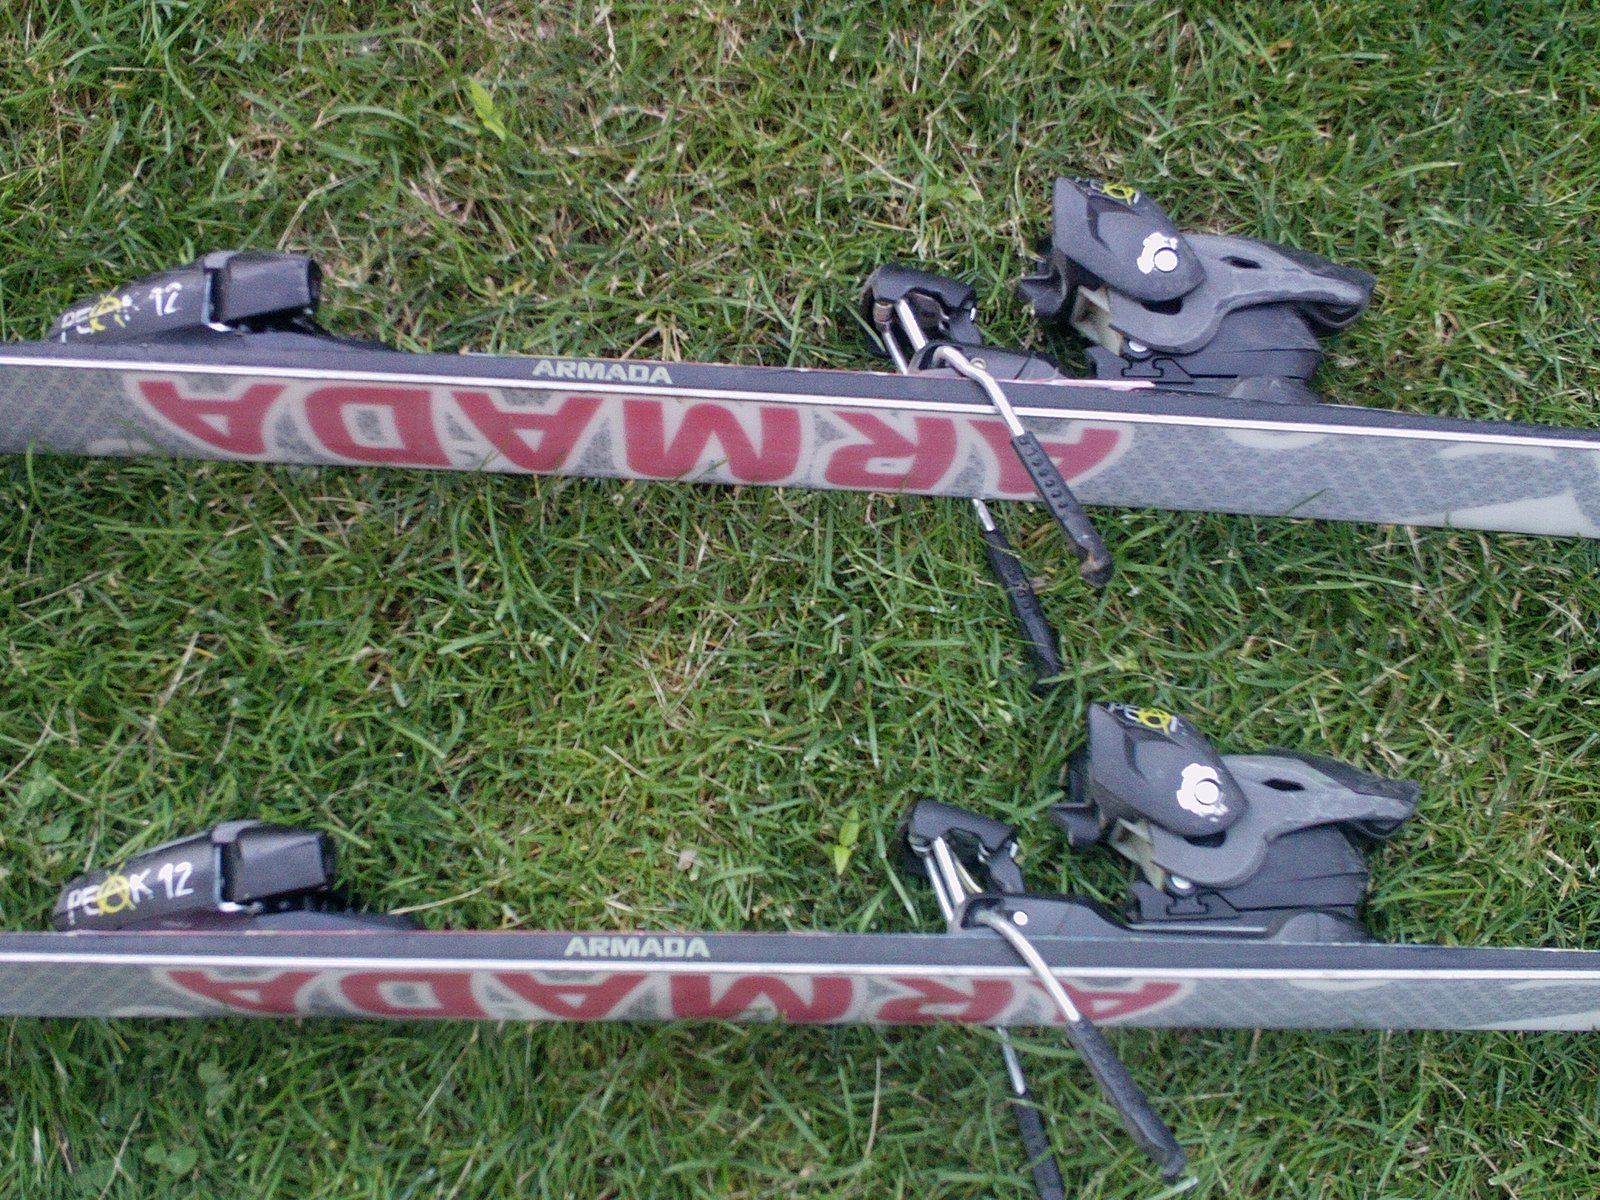 Ski for sale - 1 of 3